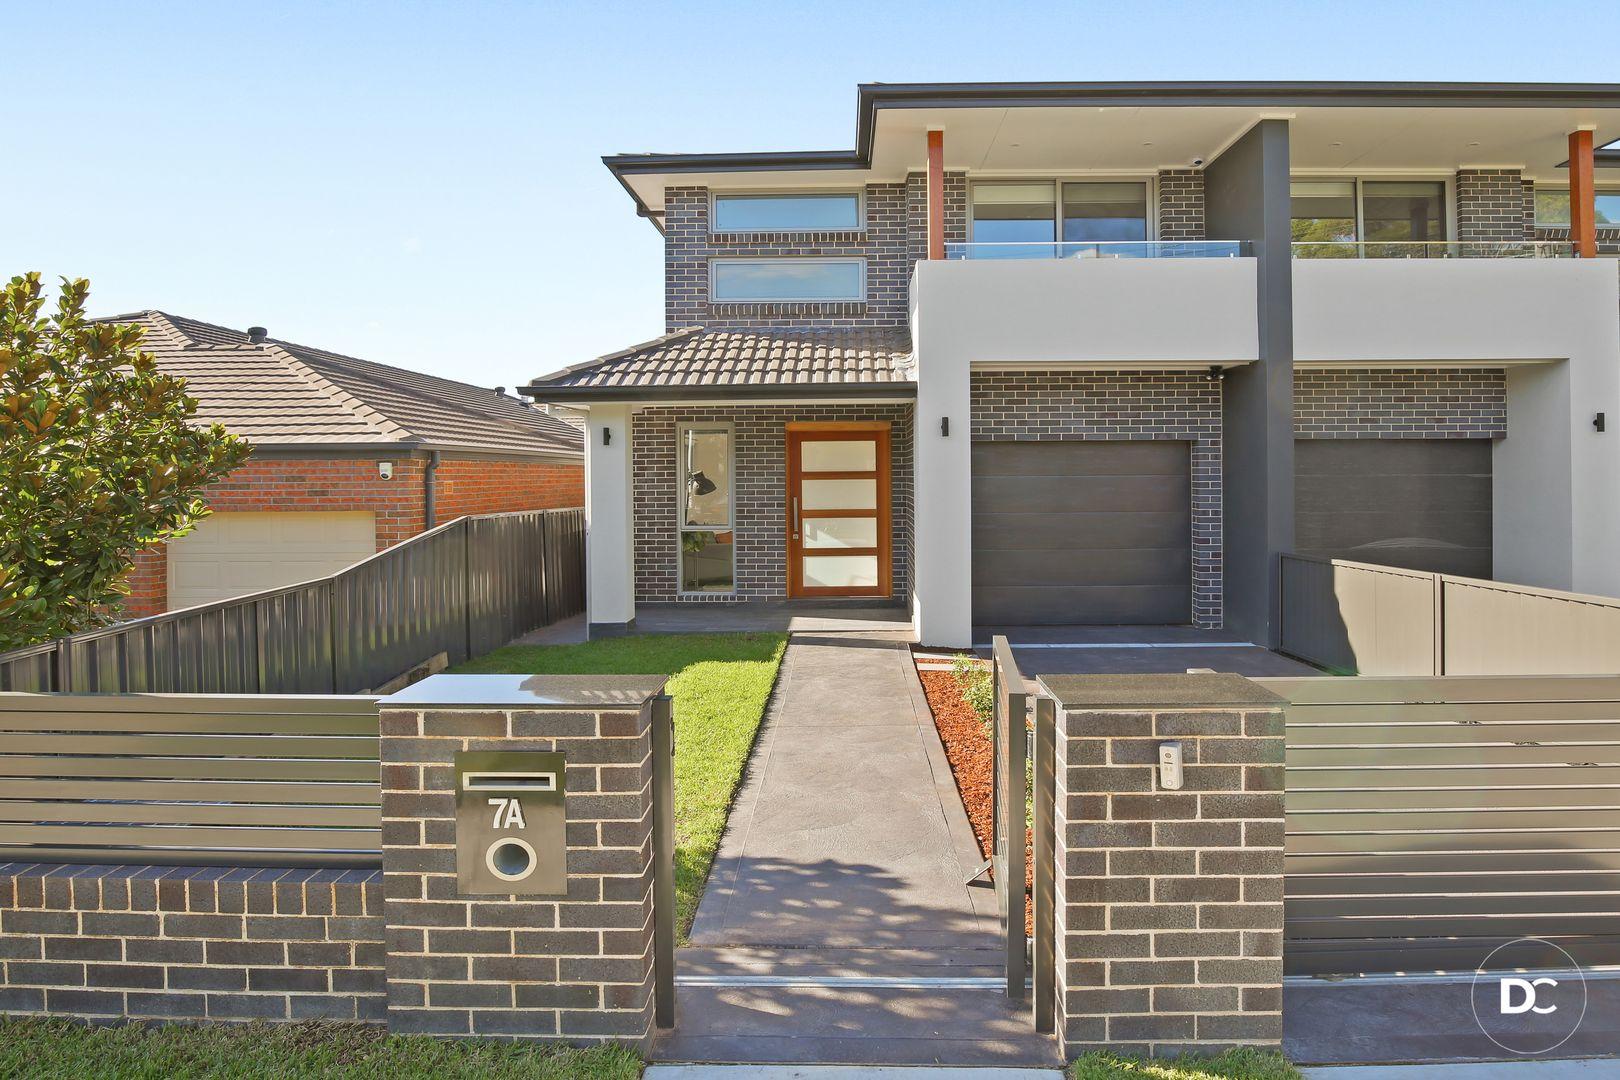 7a Beronga Street, North Strathfield NSW 2137, Image 0